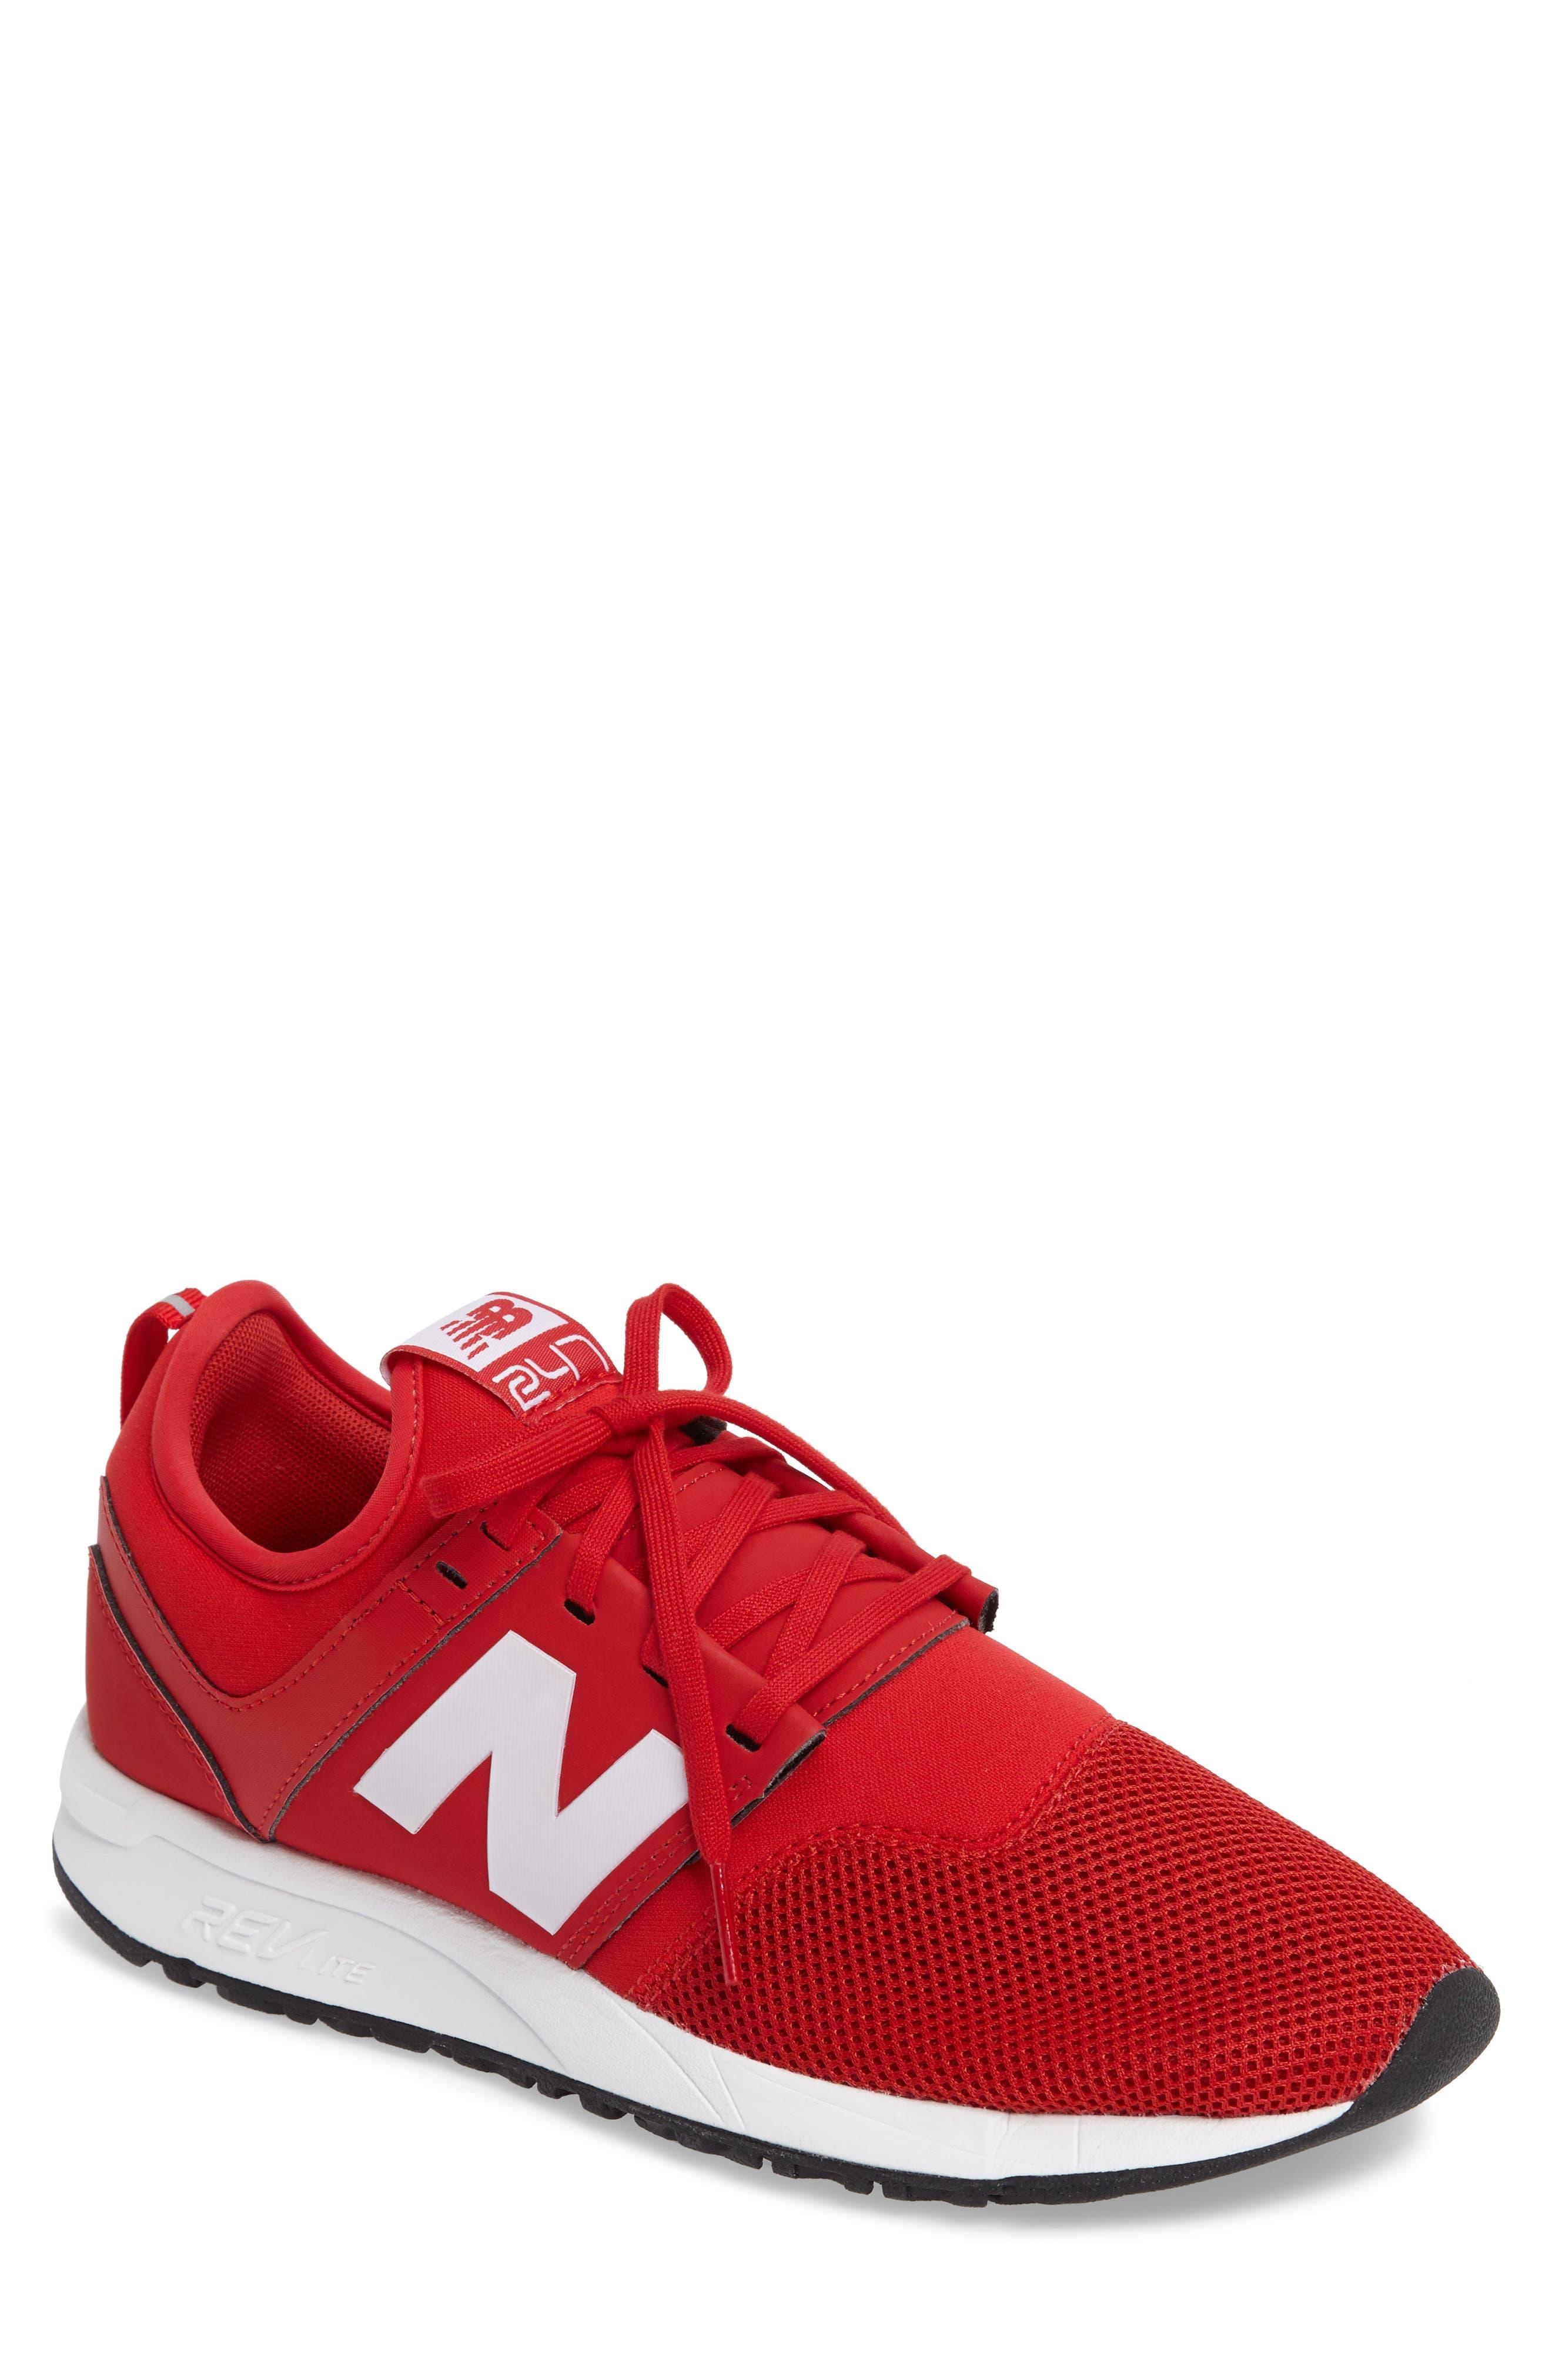 New Balance 247 Classic Pack Sneaker (Men)